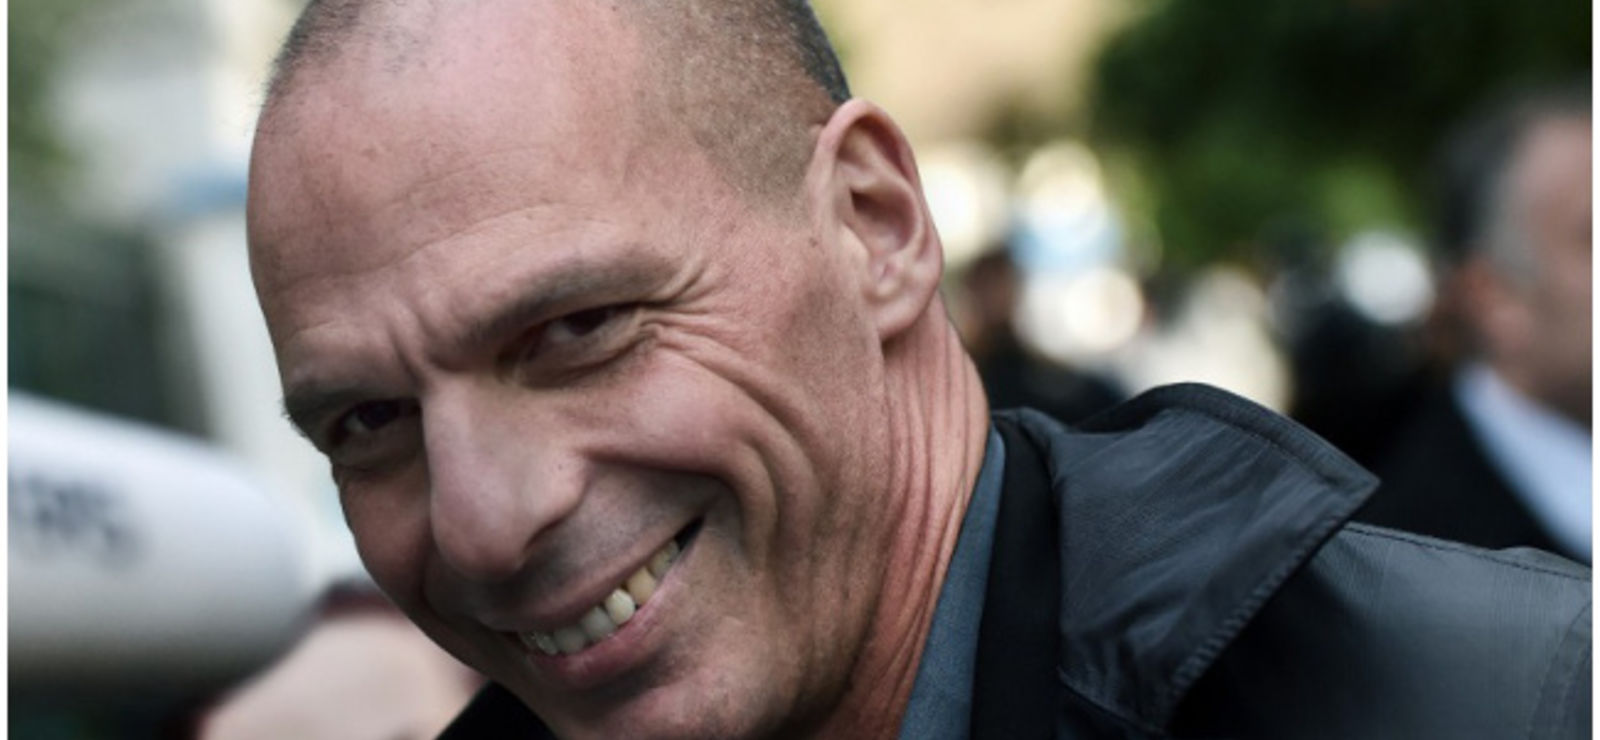 La folle semaine de Syriza : quand le ministre Varoufakis